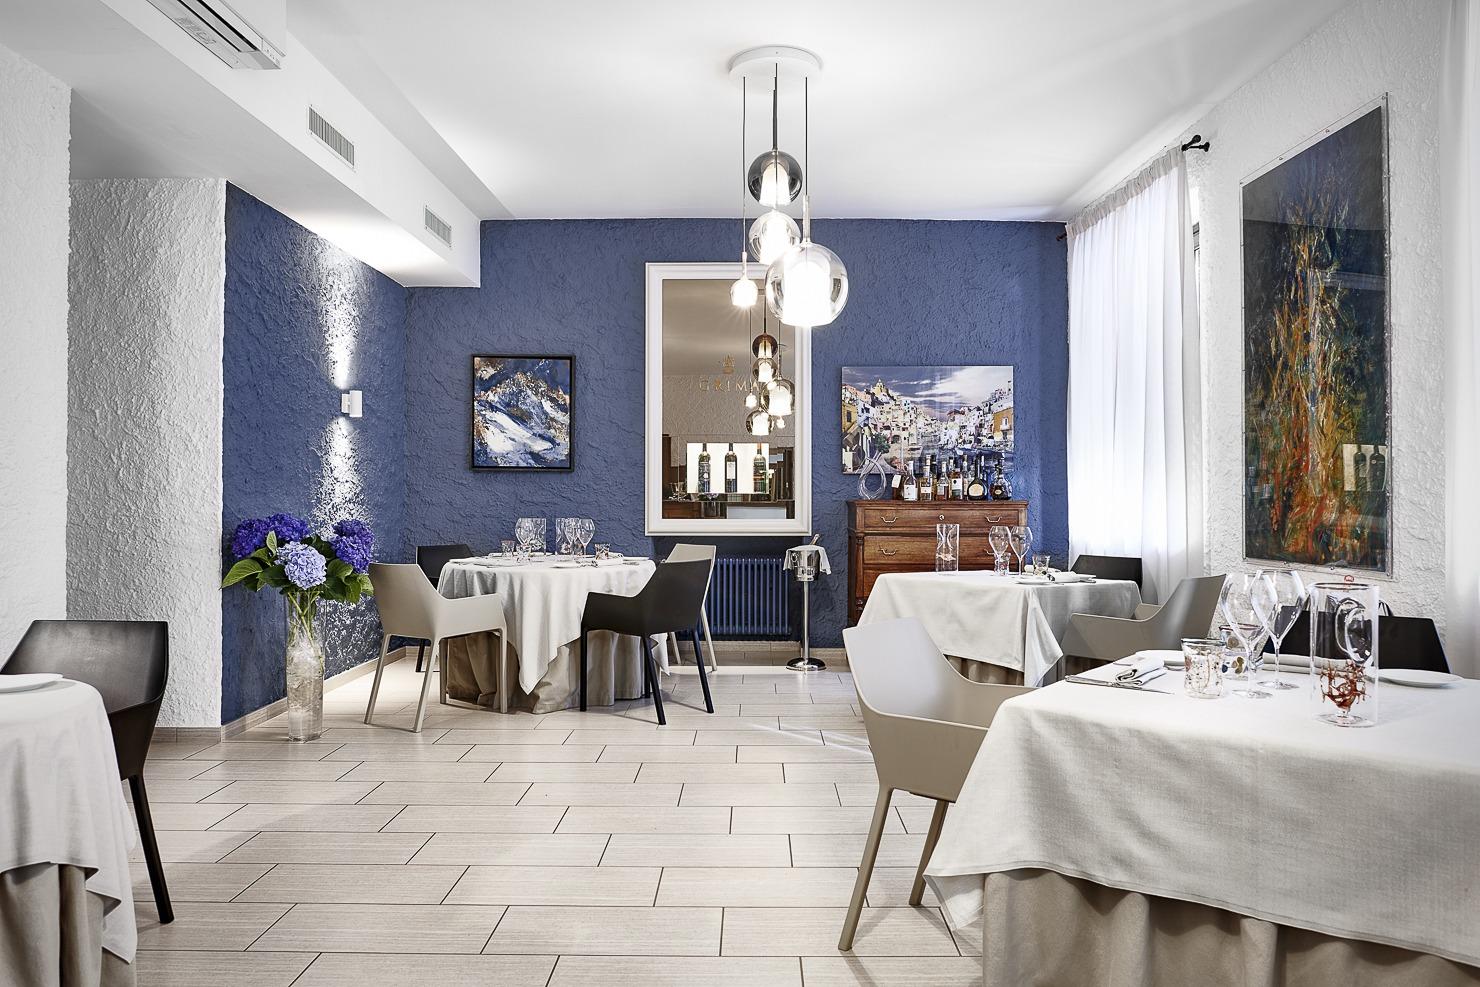 immagine-sala-ristorante